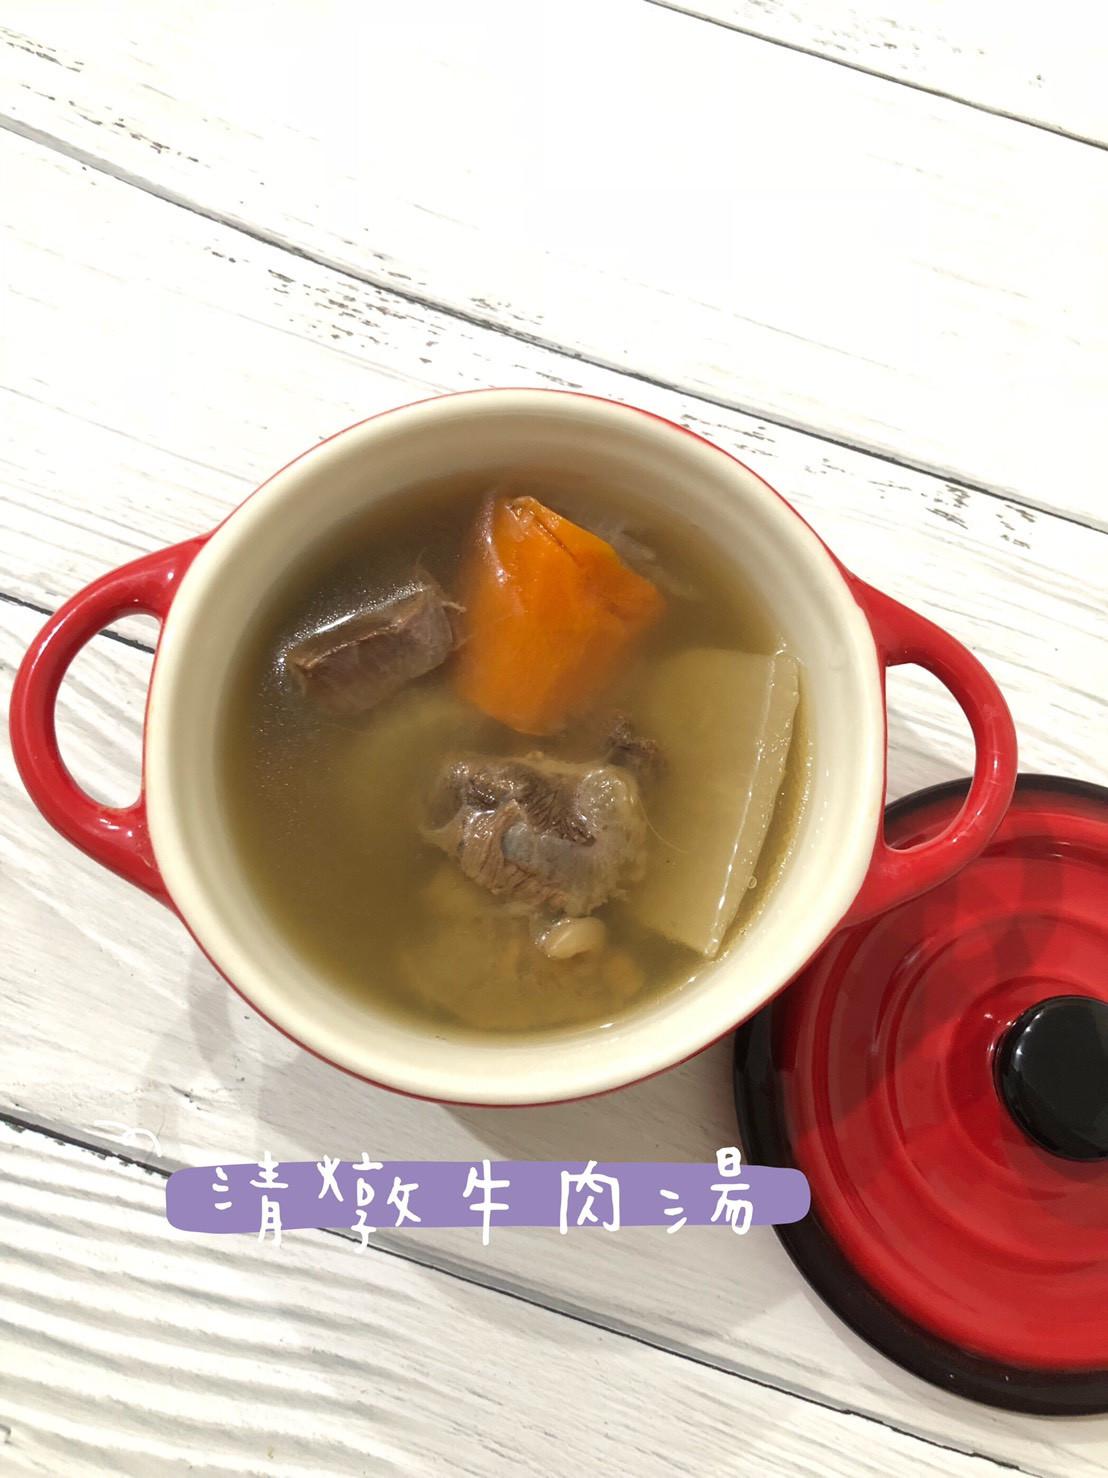 WMF PRO 快力鍋省瓦斯又能輕鬆上菜的第 2 張圖片